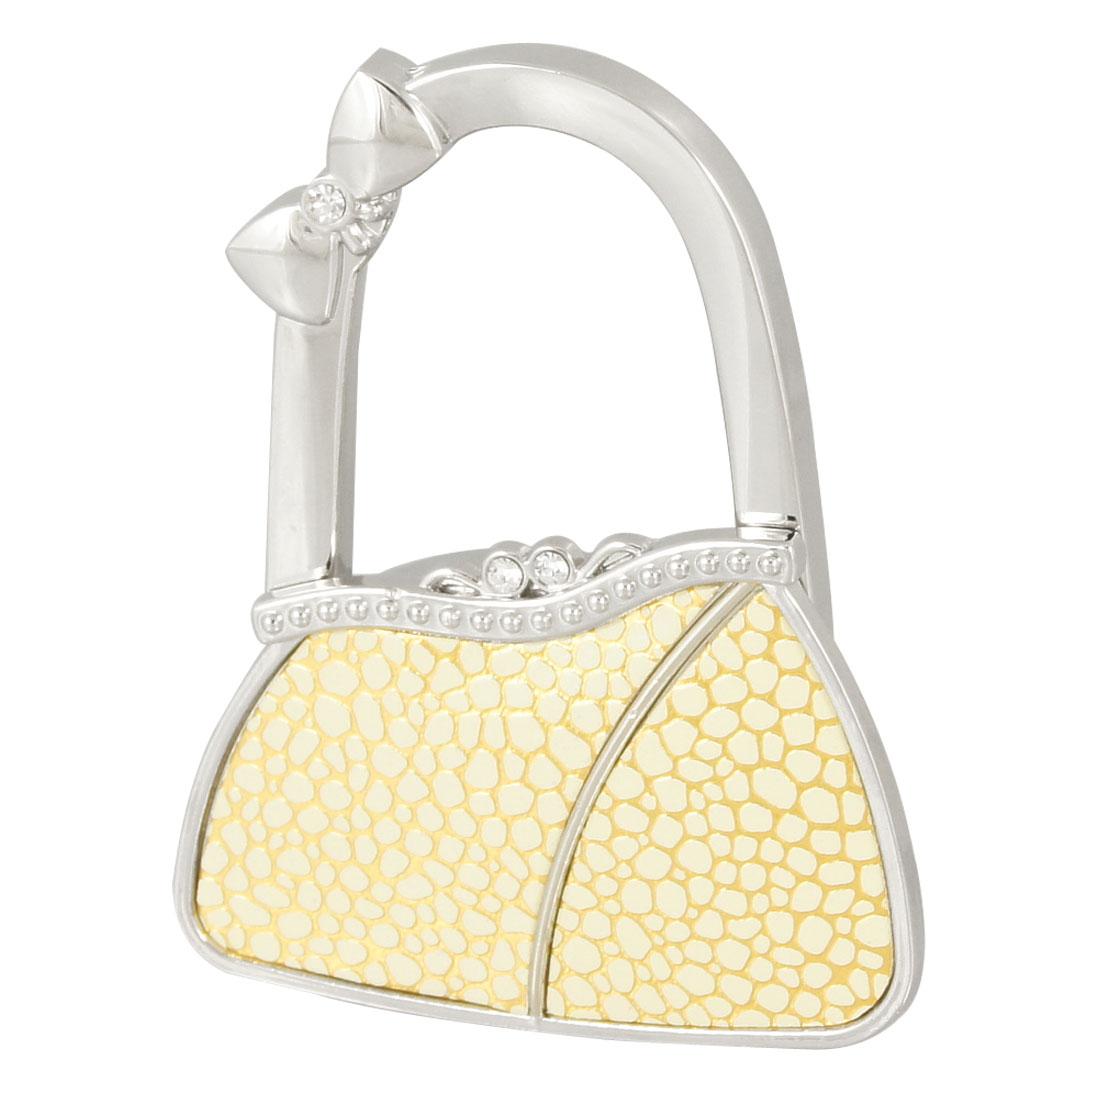 Silver Tone Beige Metal Bowknot Accent Bag Shape Folding Handbag Hook